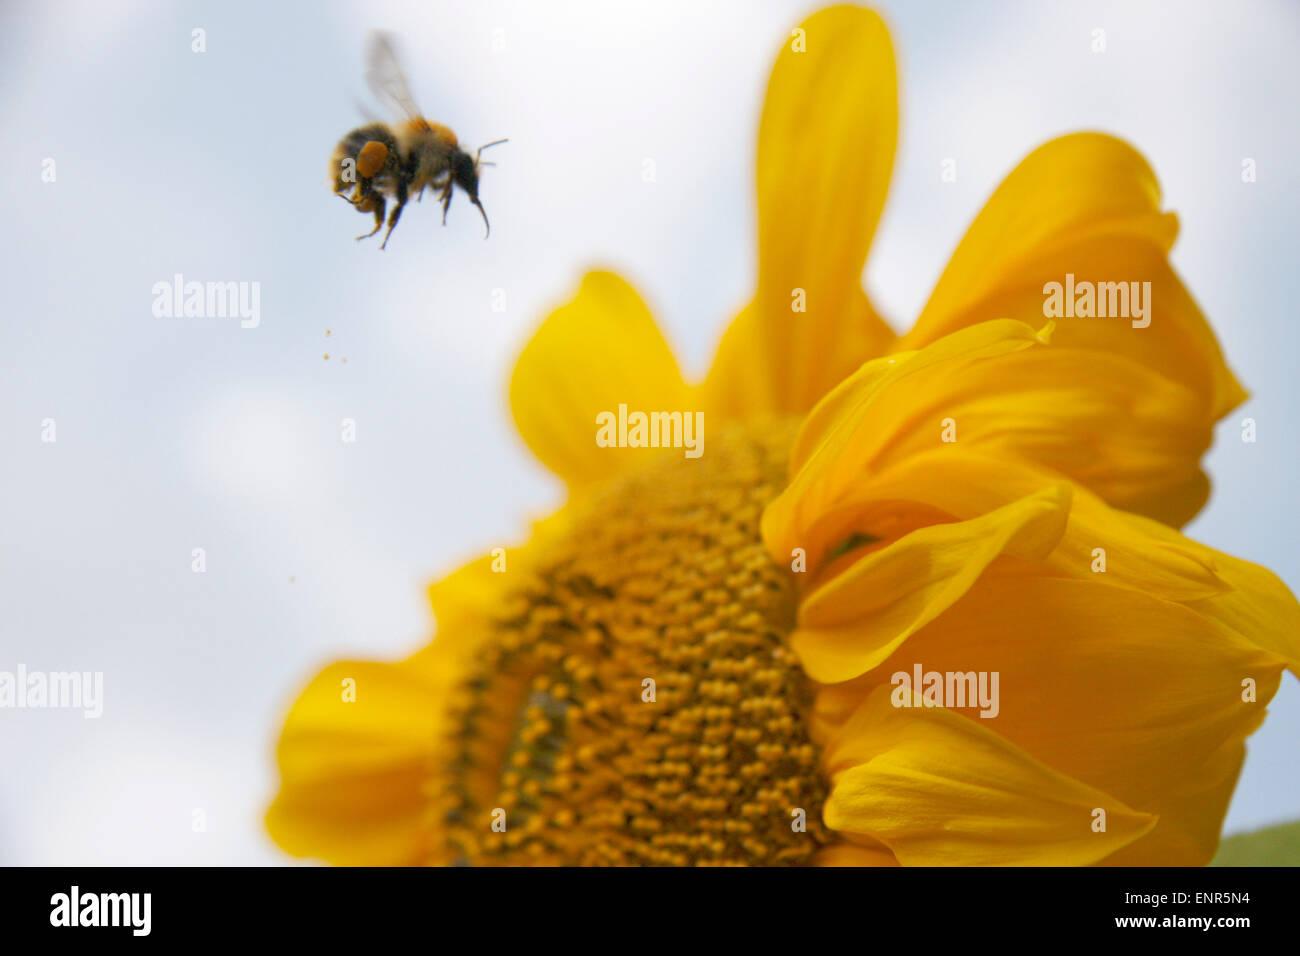 Hummel, Sonnenblume. - Stock Image